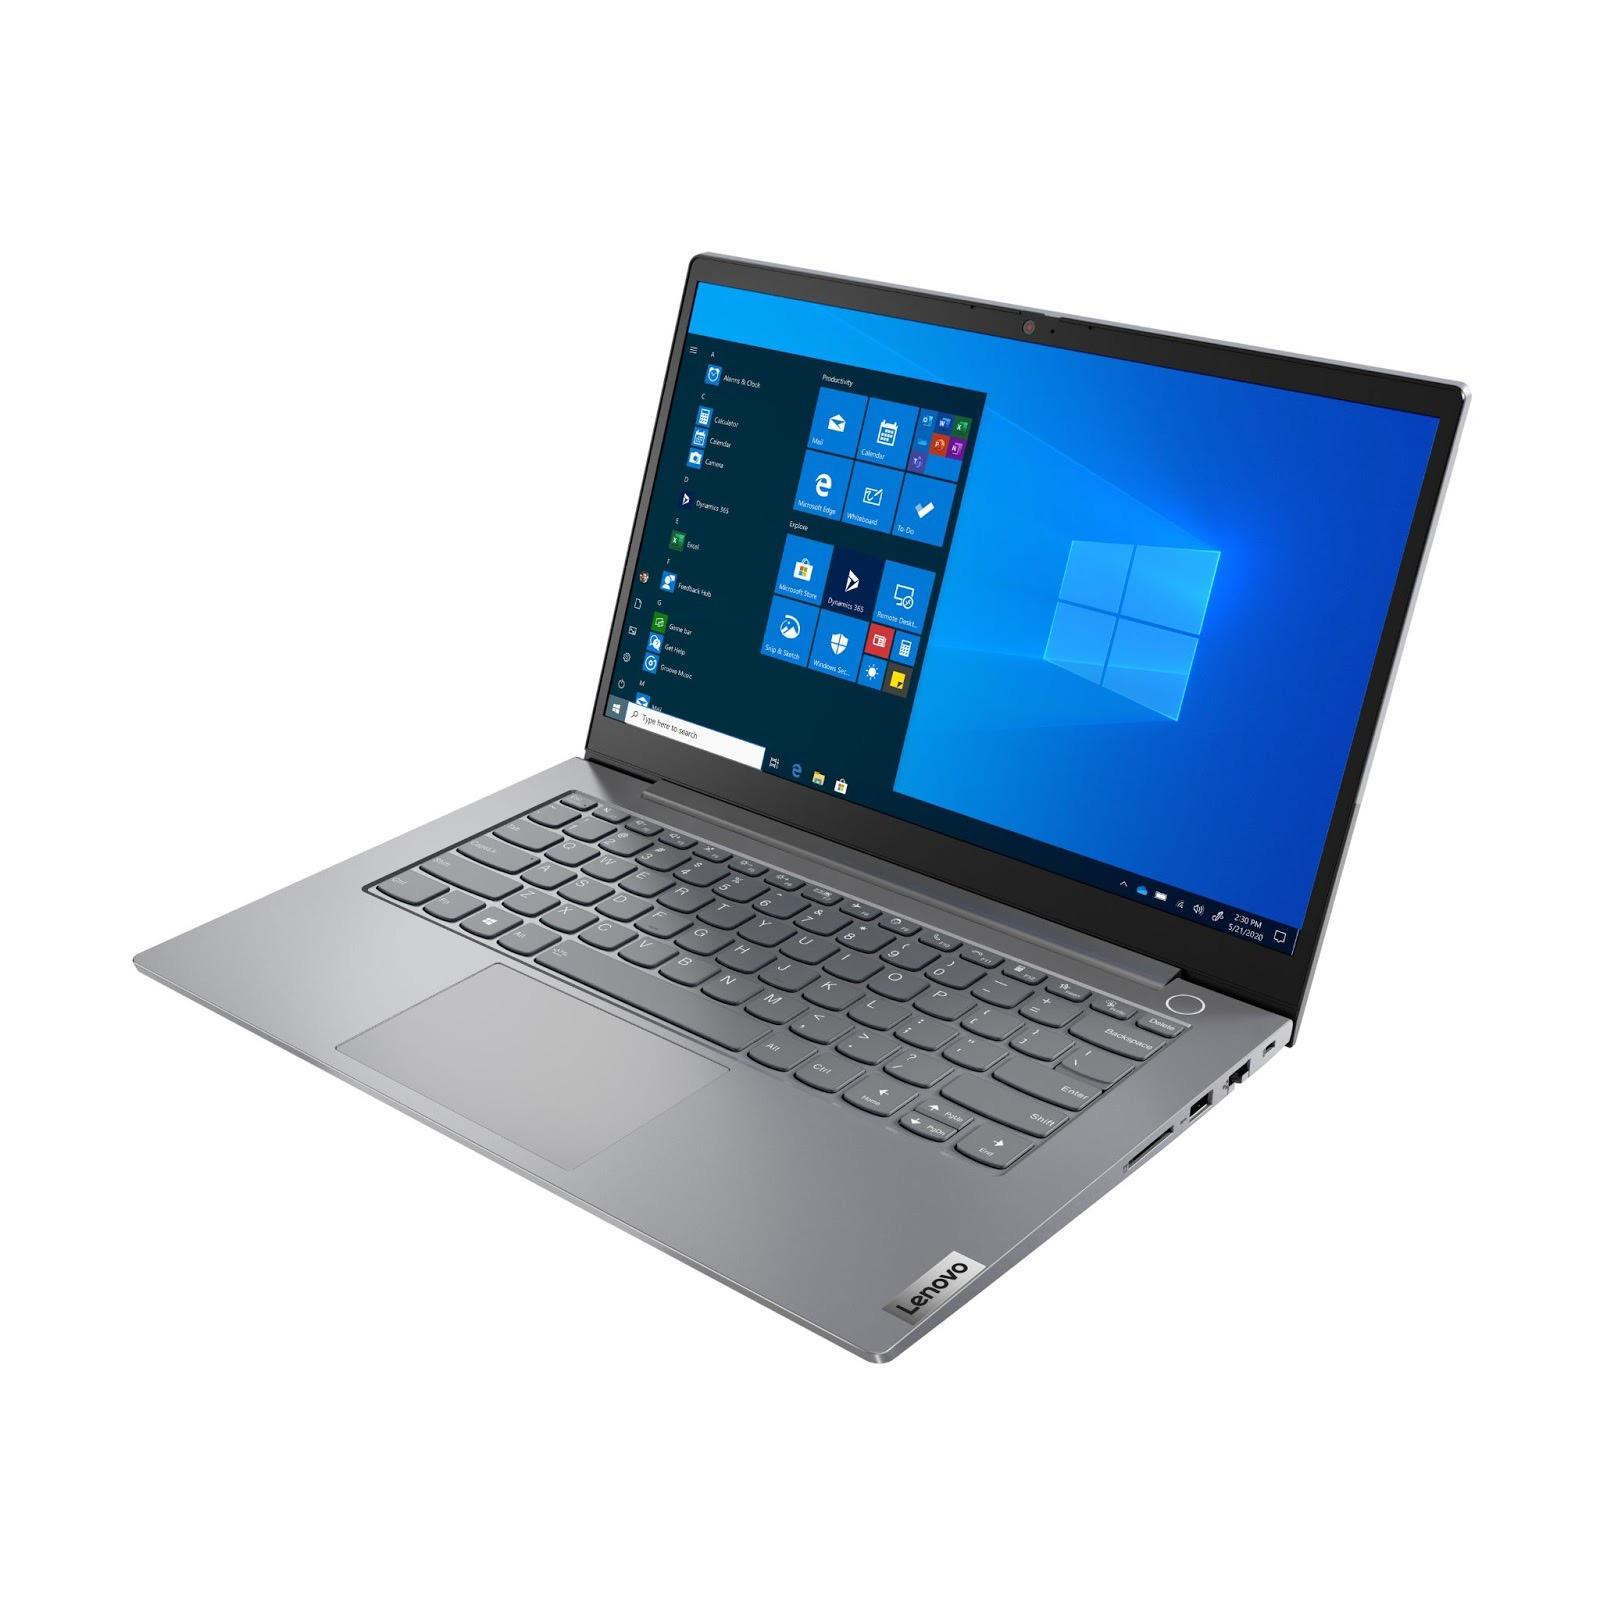 Фото 2. Ноутбук Lenovo ThinkBook 14 Gen 2 ITL Mineral Grey (20VD006CRU)